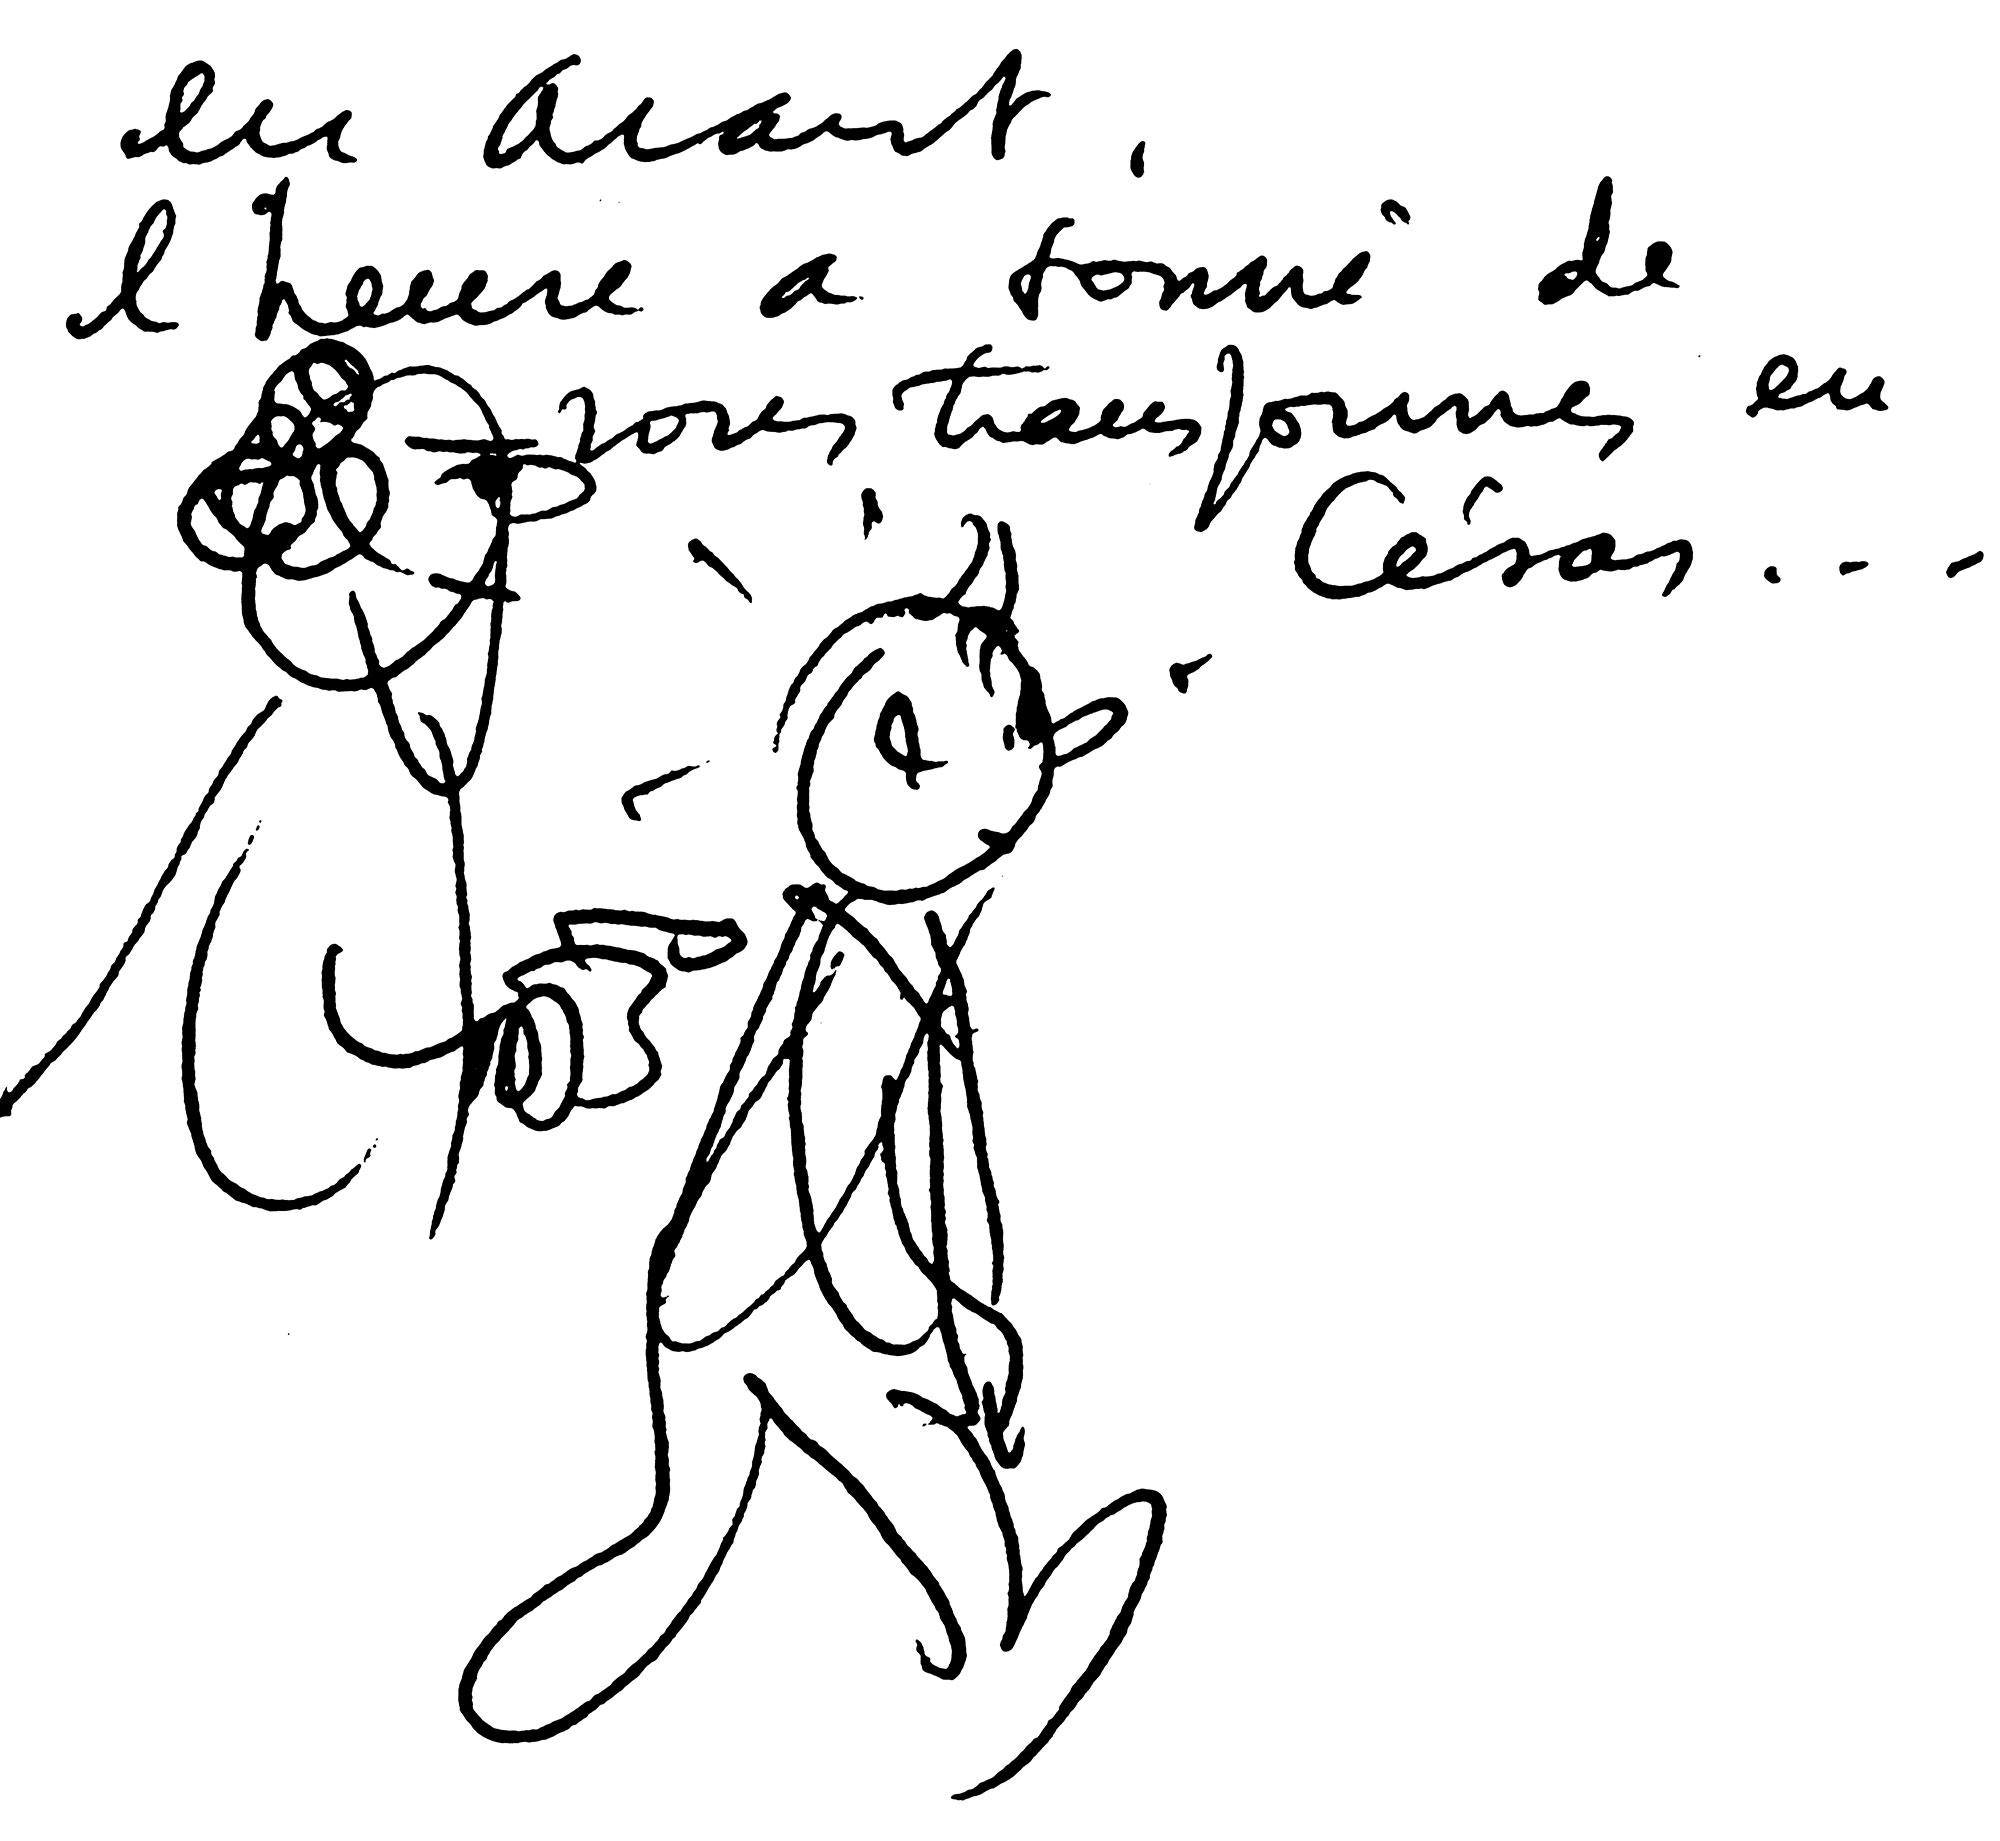 Tintin - The Adventures of Tintin - Tintin and Alph-Art